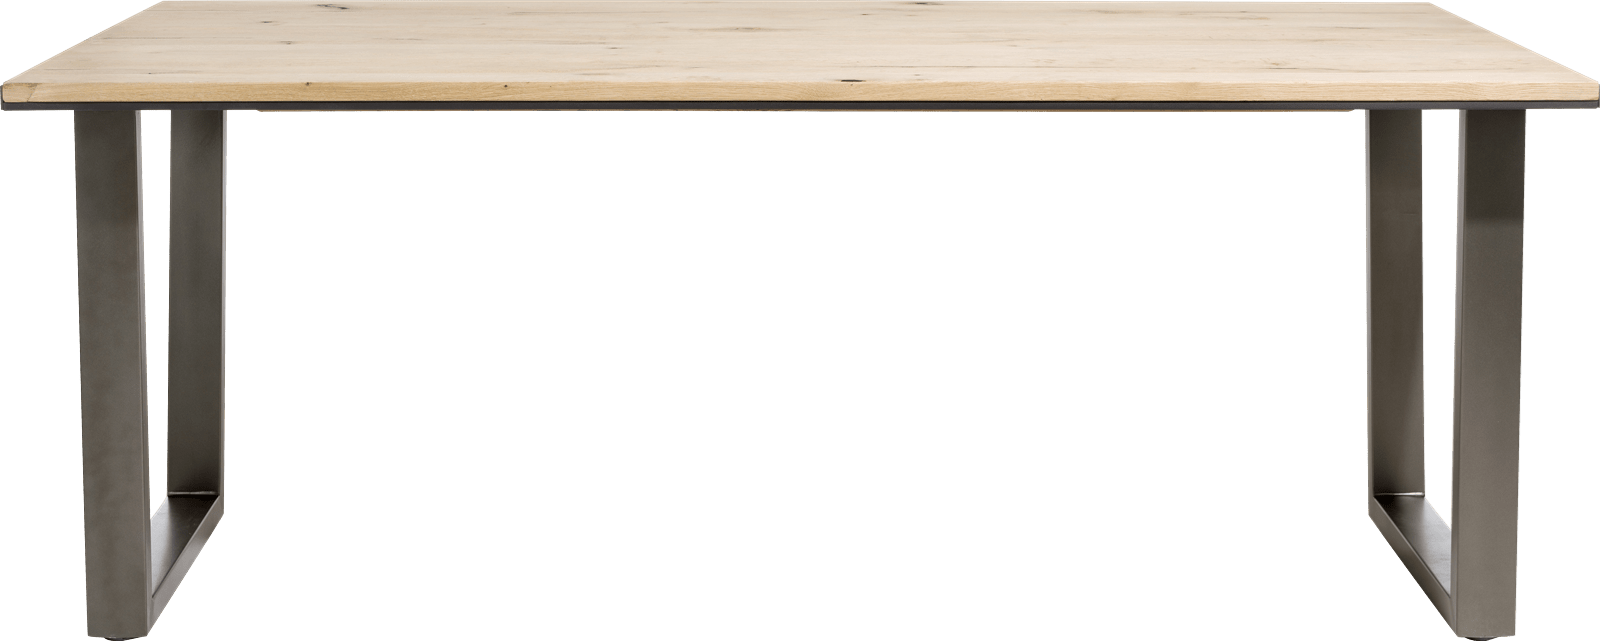 Faneur - eetkamertafel 170 x 100 cm - v-poot